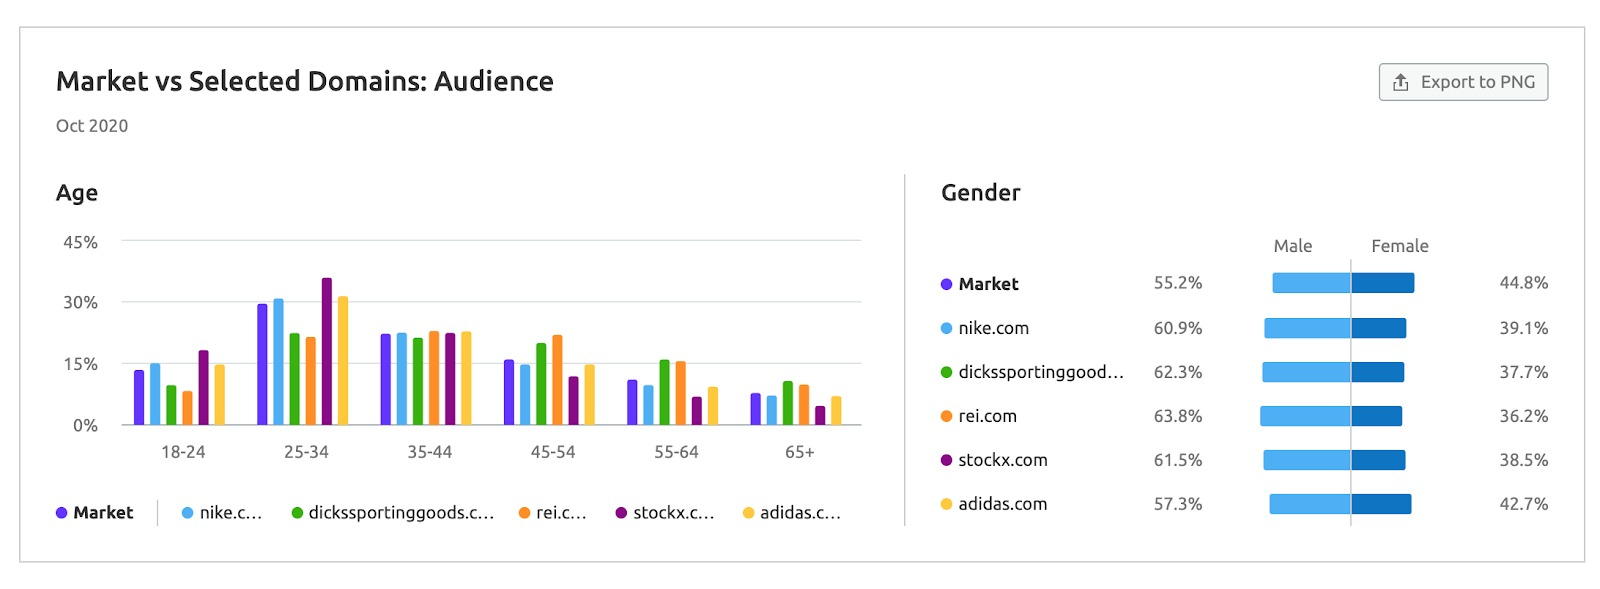 Market Explorer Benchmarking Report image 3